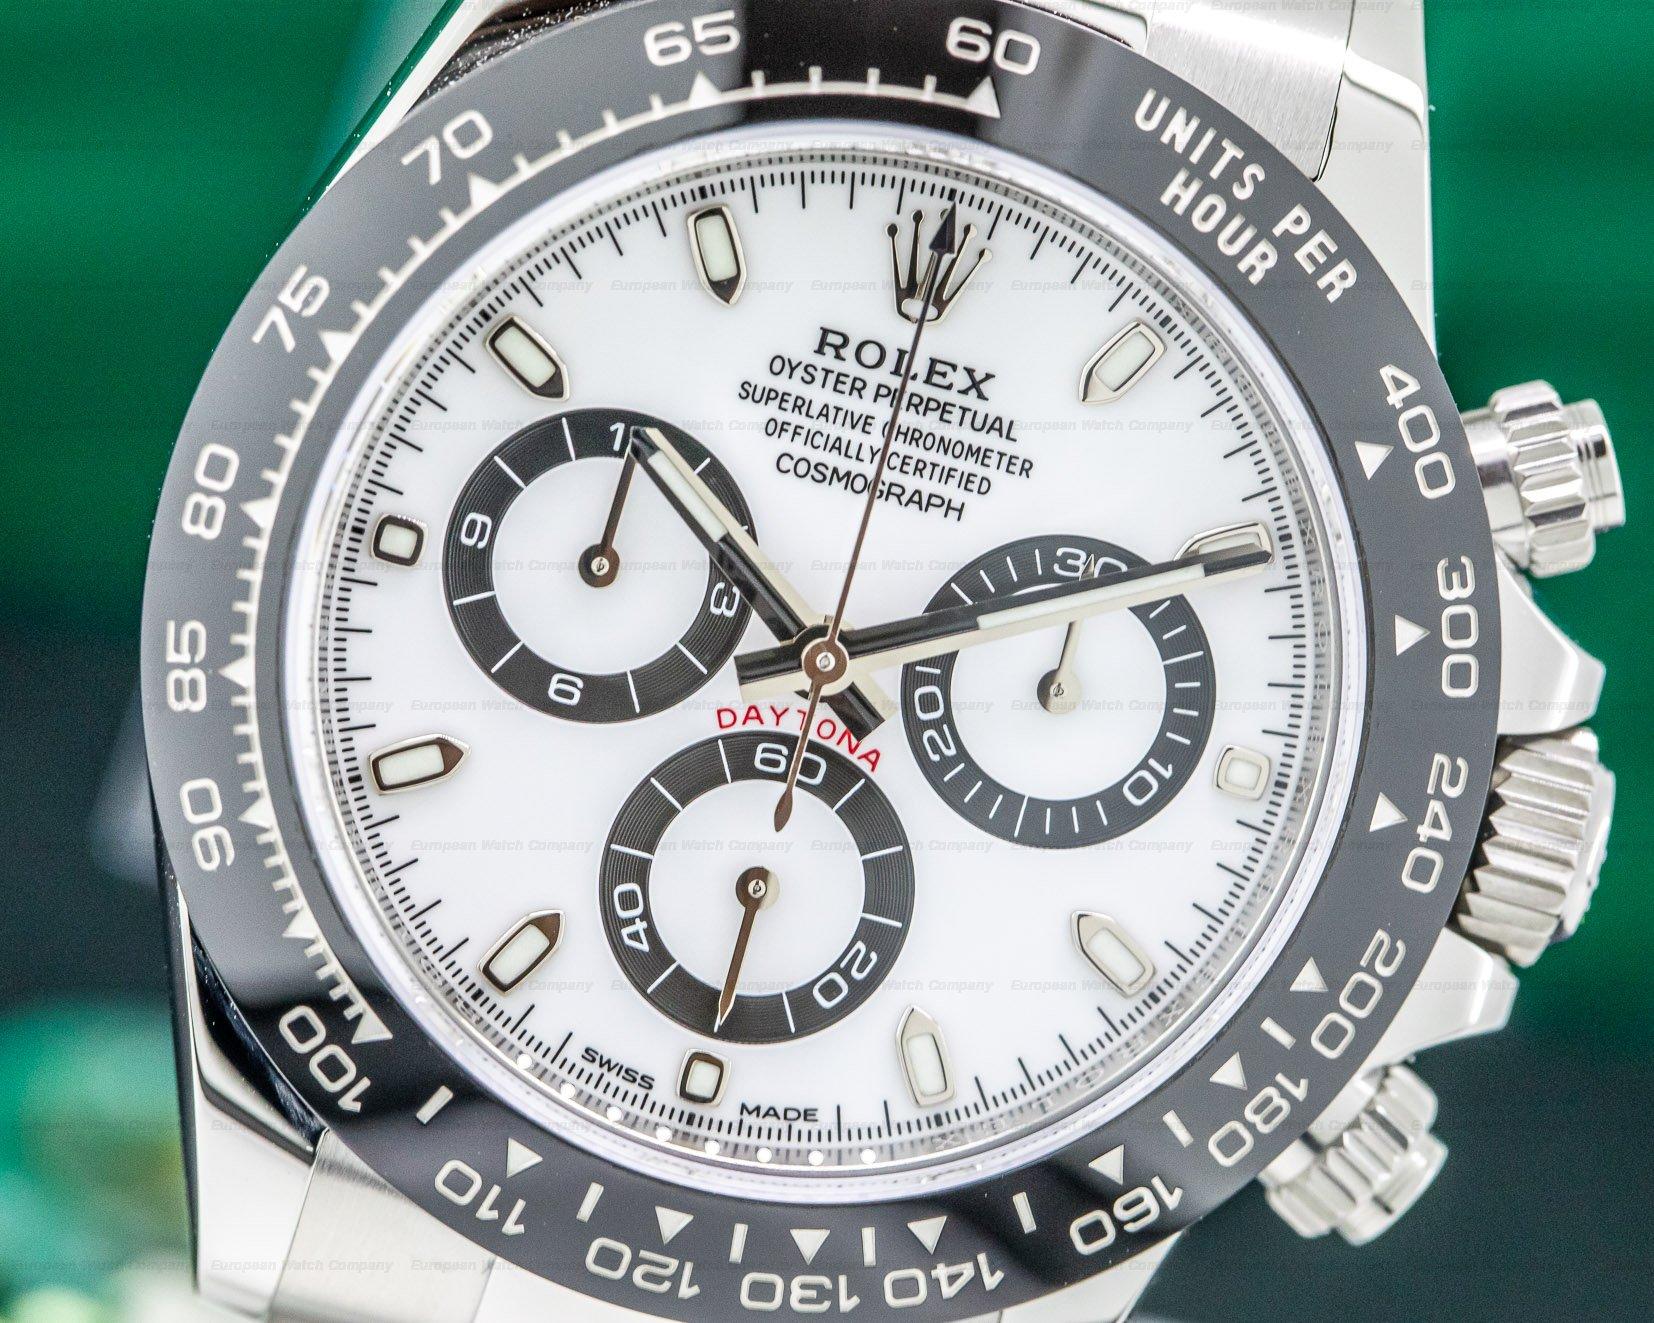 Rolex 116500LN Daytona Ceramic Bezel SS / White Dial UNWORN